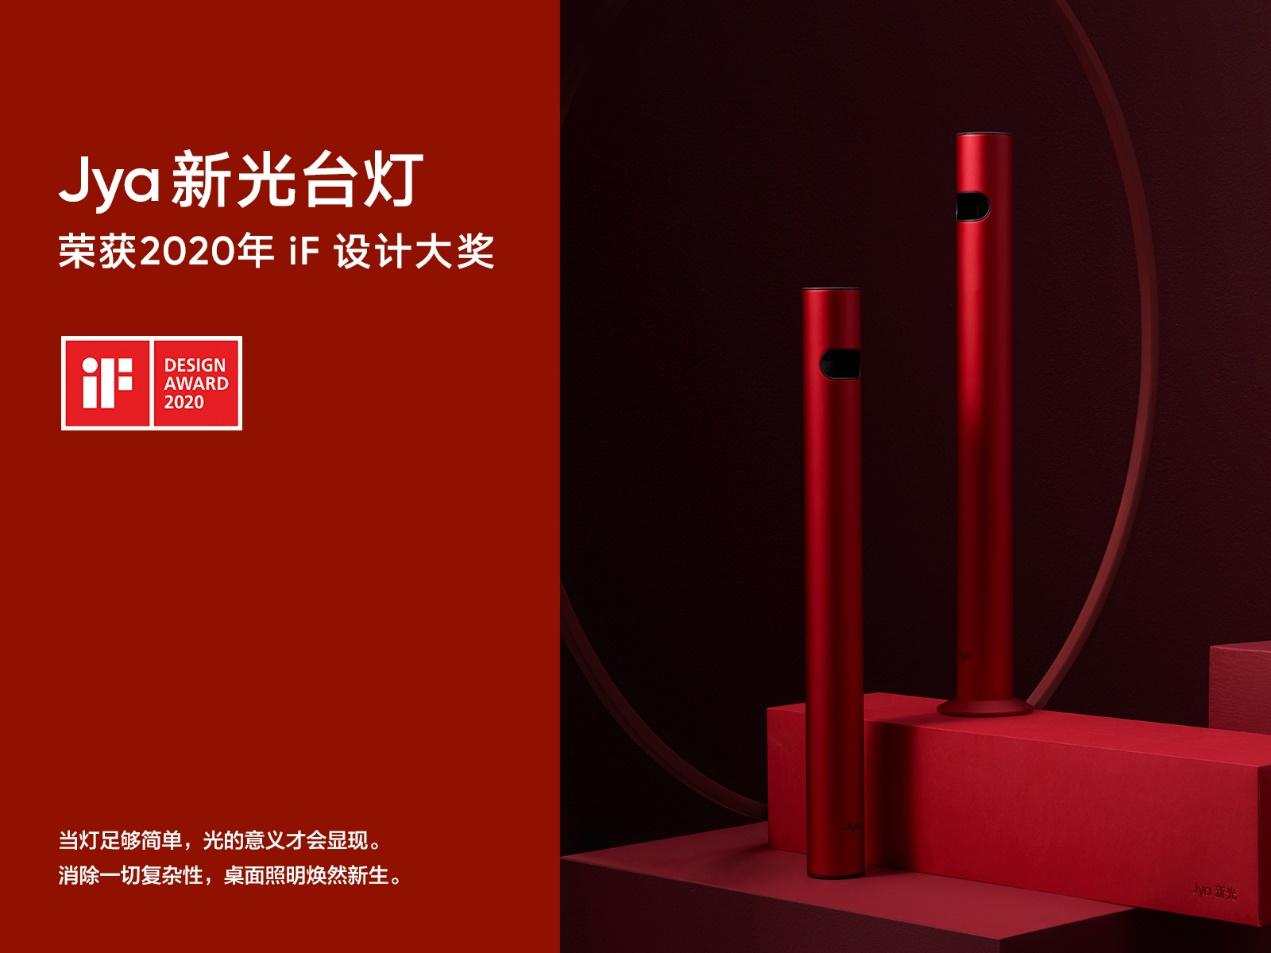 Jya新光台灯、对流电暖器荣获2020 iF设计奖